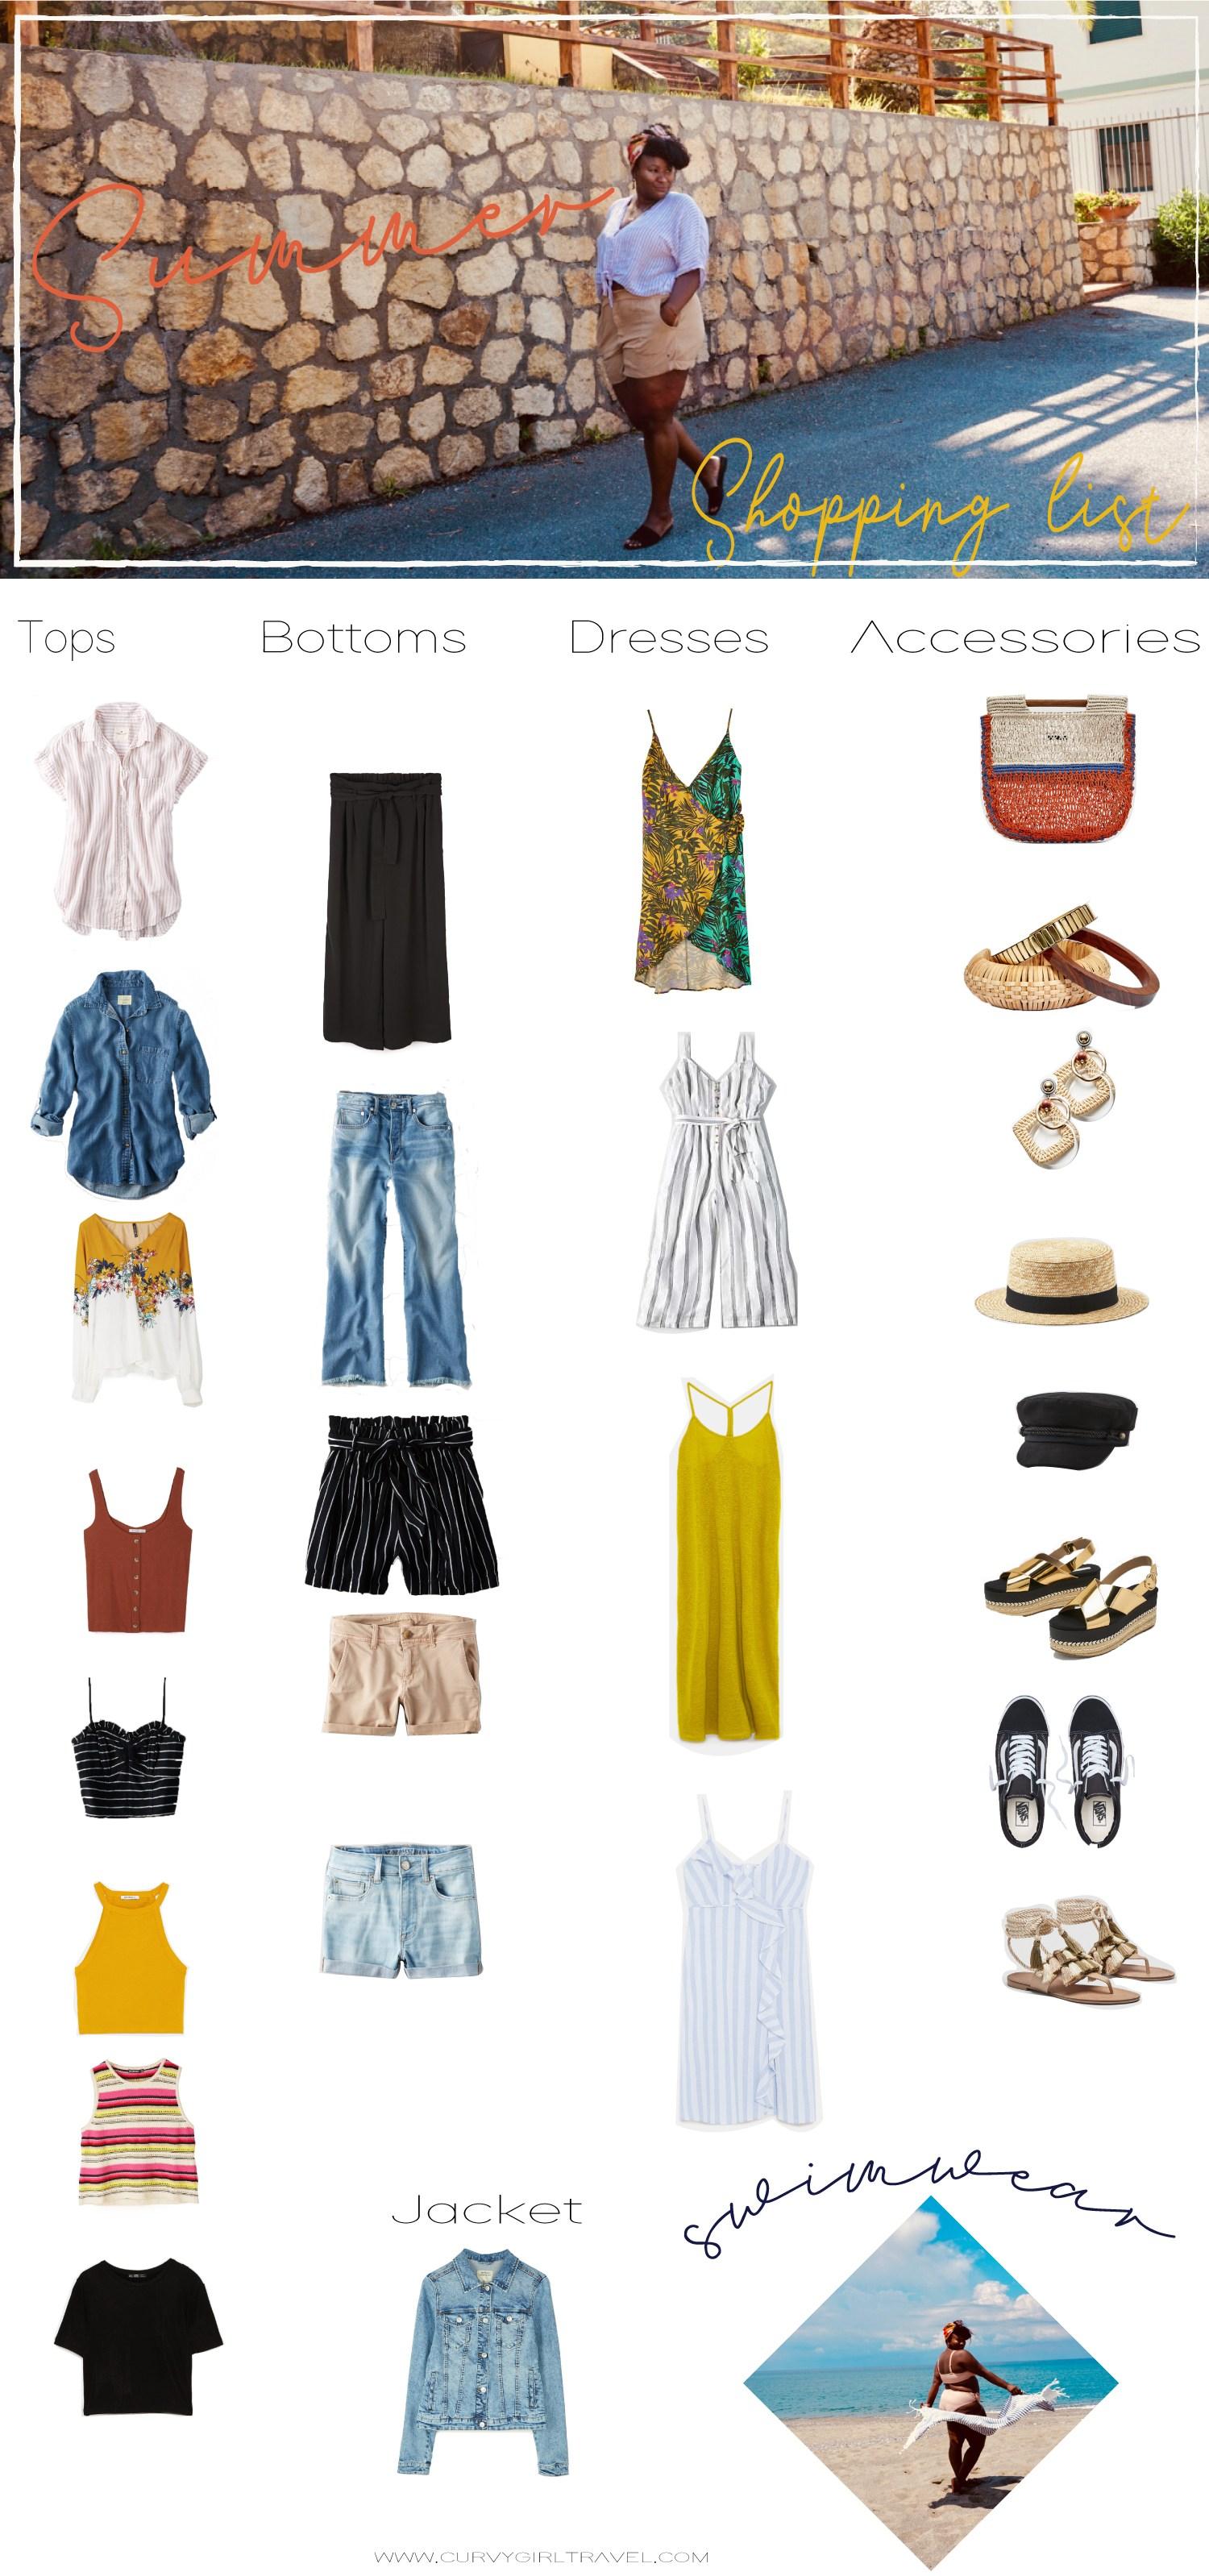 summer-2018-shopping-list-.jpg